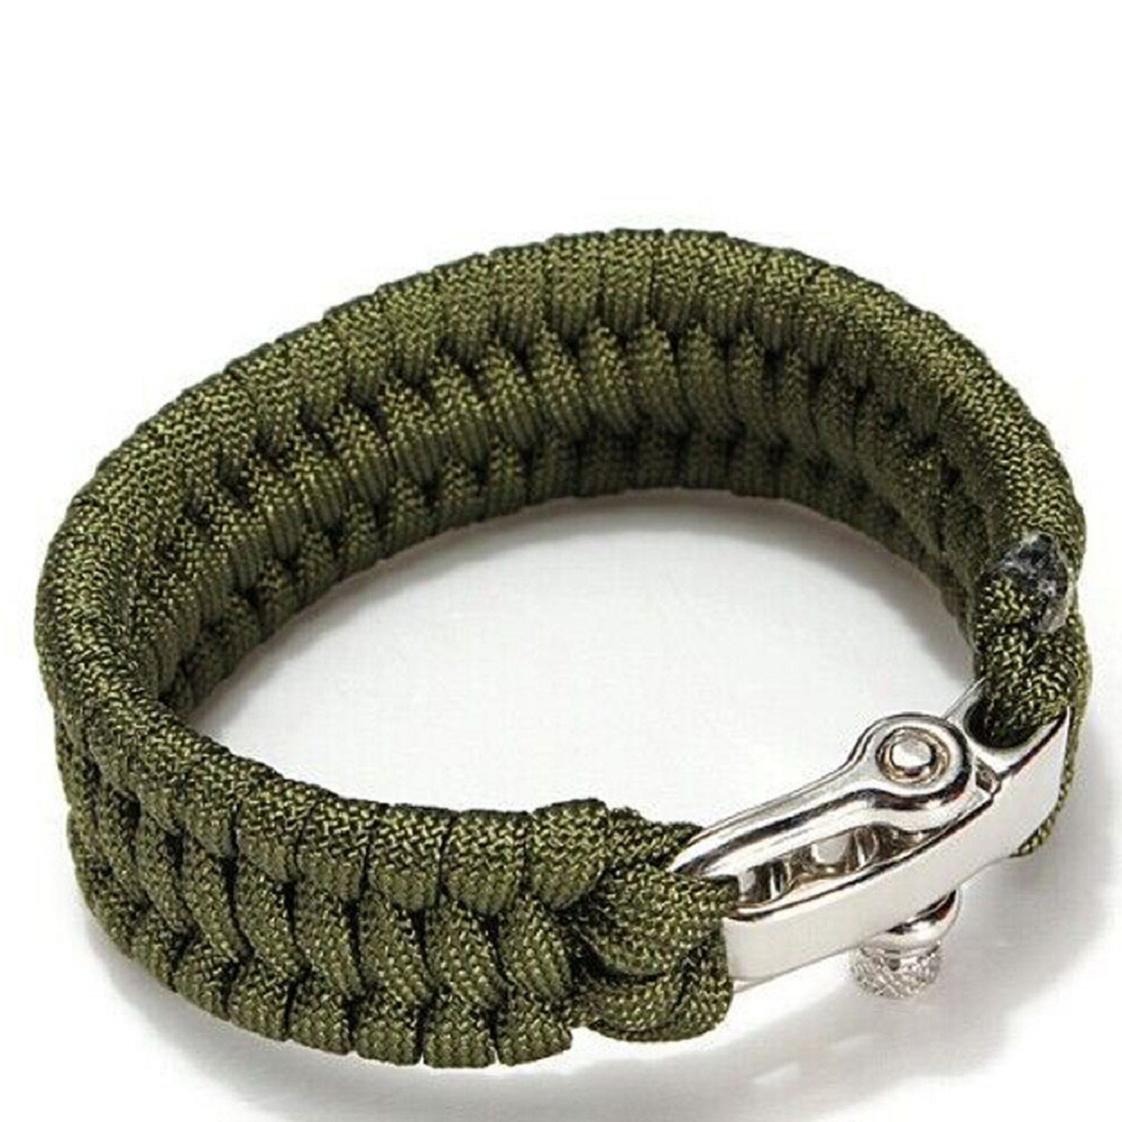 Survival Rope Bracelet Outdoor Camping Hiking Steel Shackle Buckle New